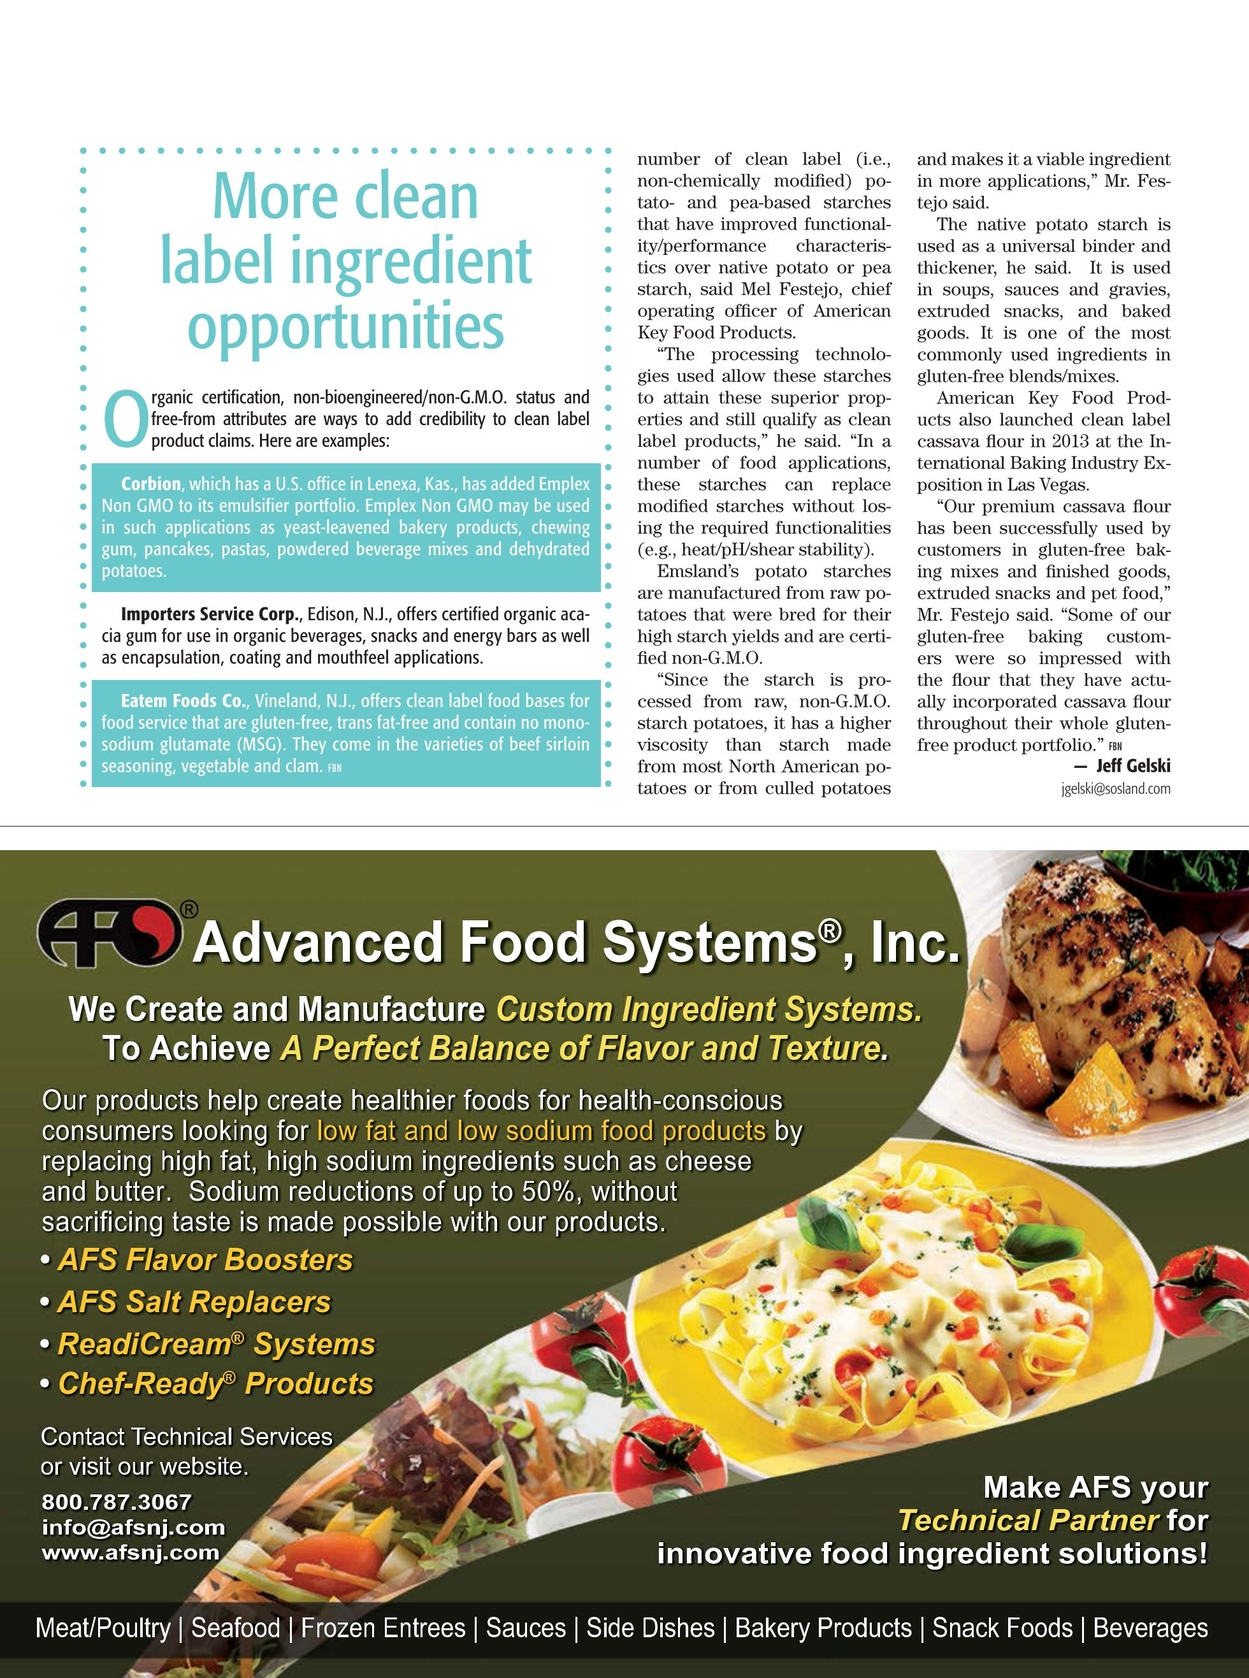 Food Business News - February 24, 2015